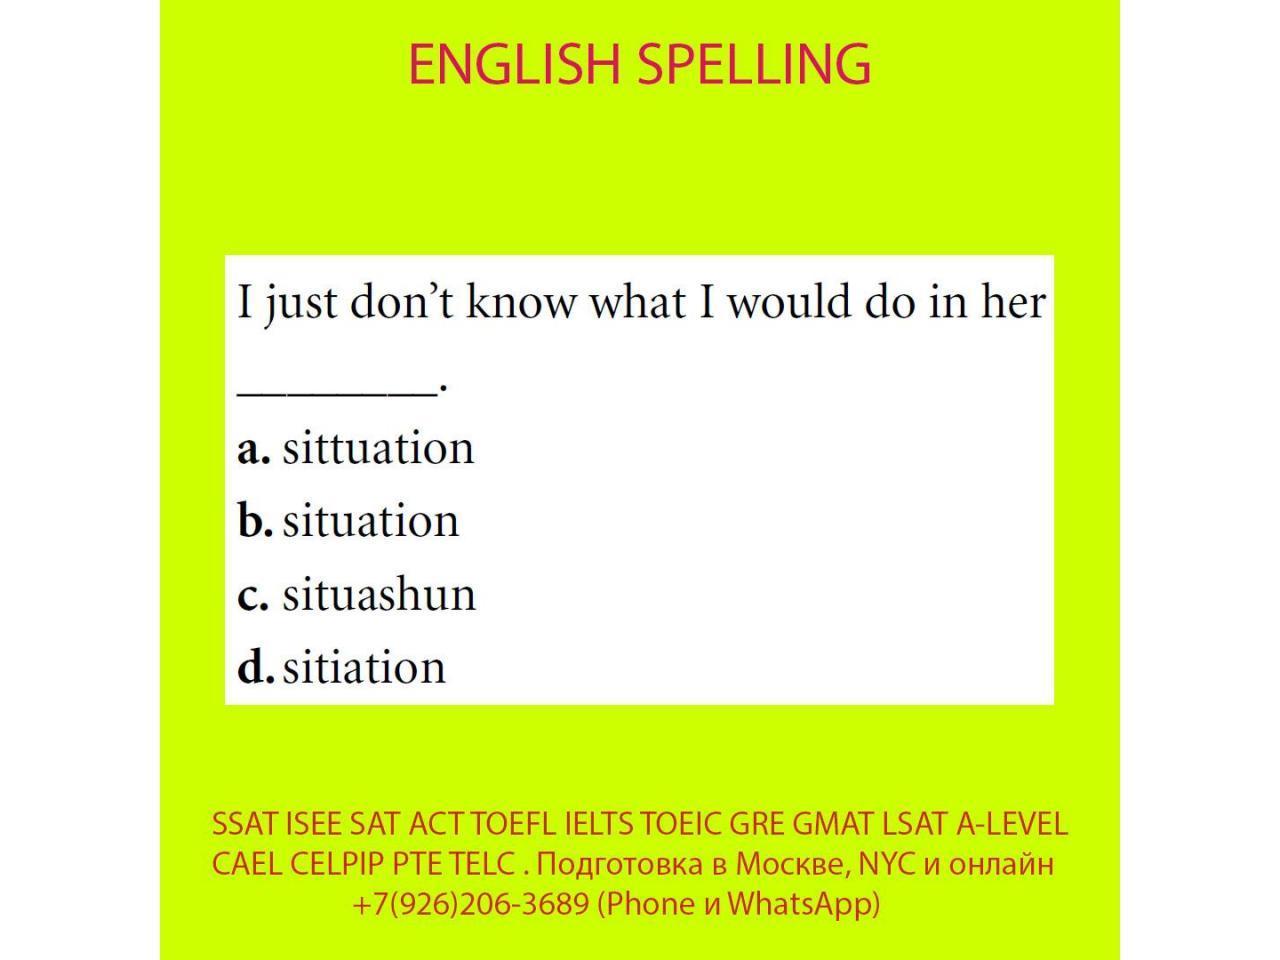 Курсы SSAT, ISEE, SAT, ACT, TOEFL, TOEIC преподаватель, репетитор из США - 10